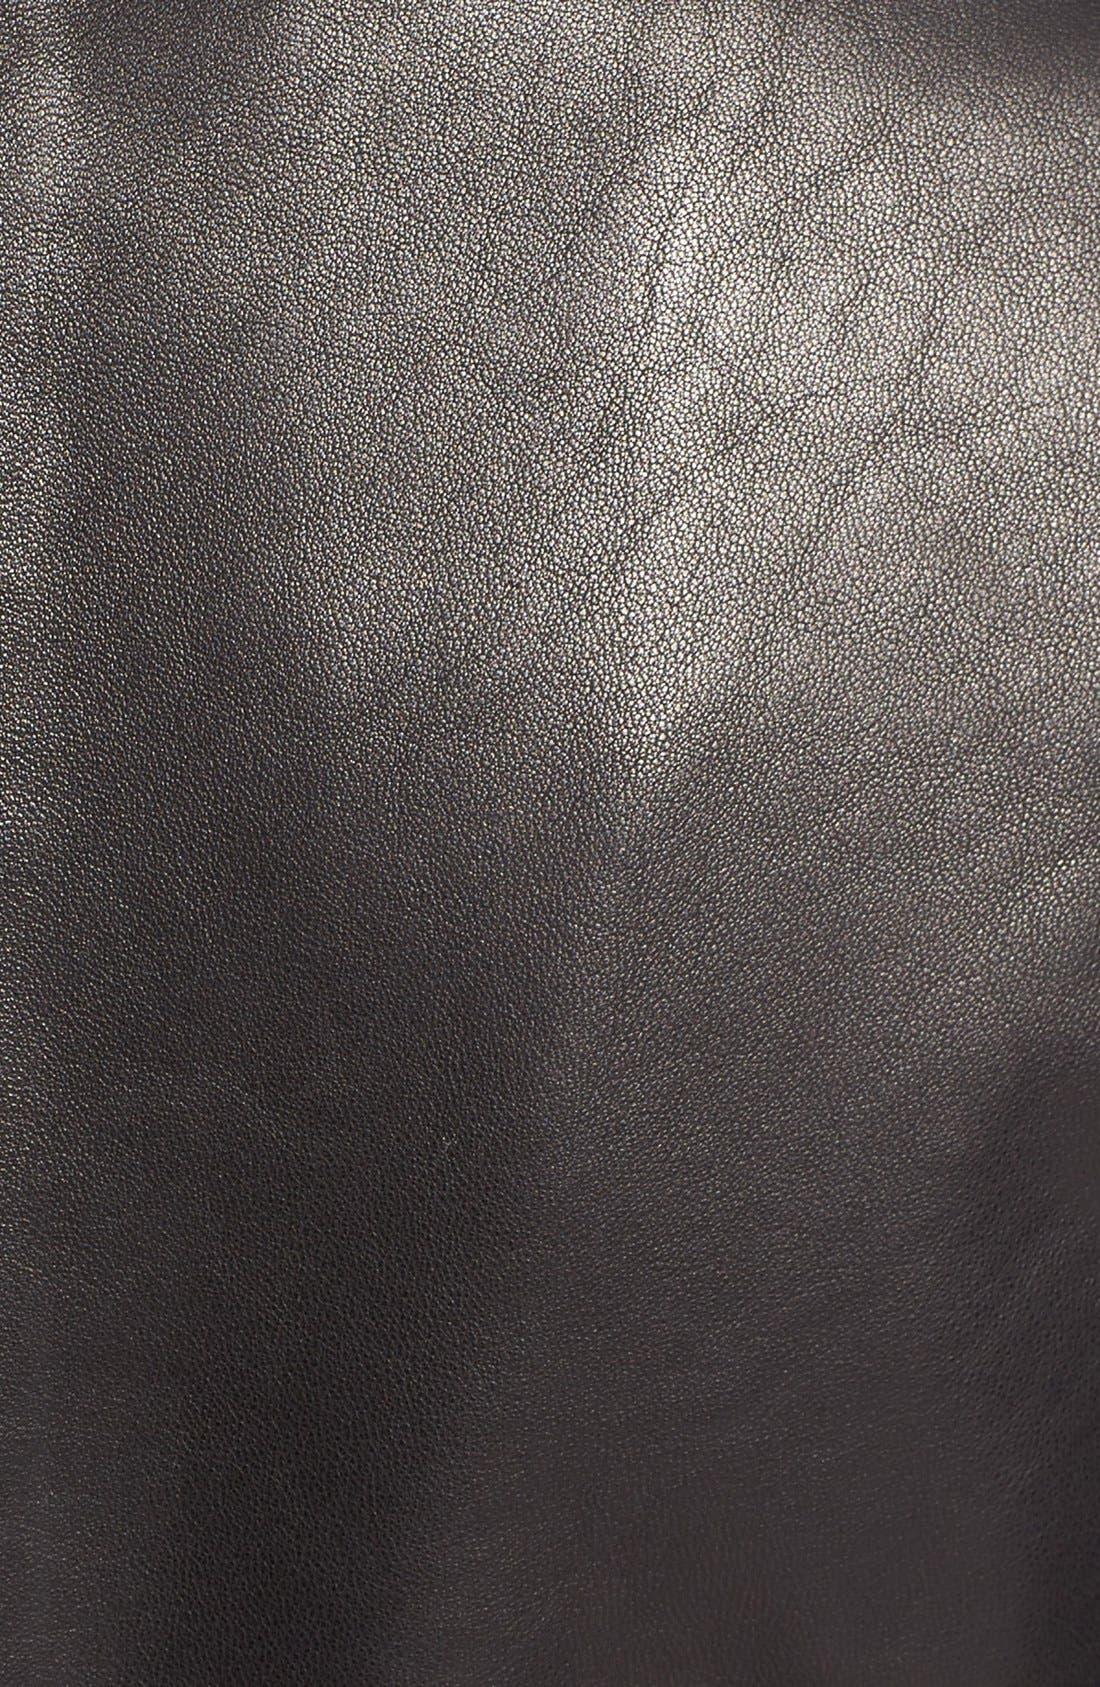 Alternate Image 5  - Via Spiga Mixed Media Leather Moto Jacket (Regular & Petite)